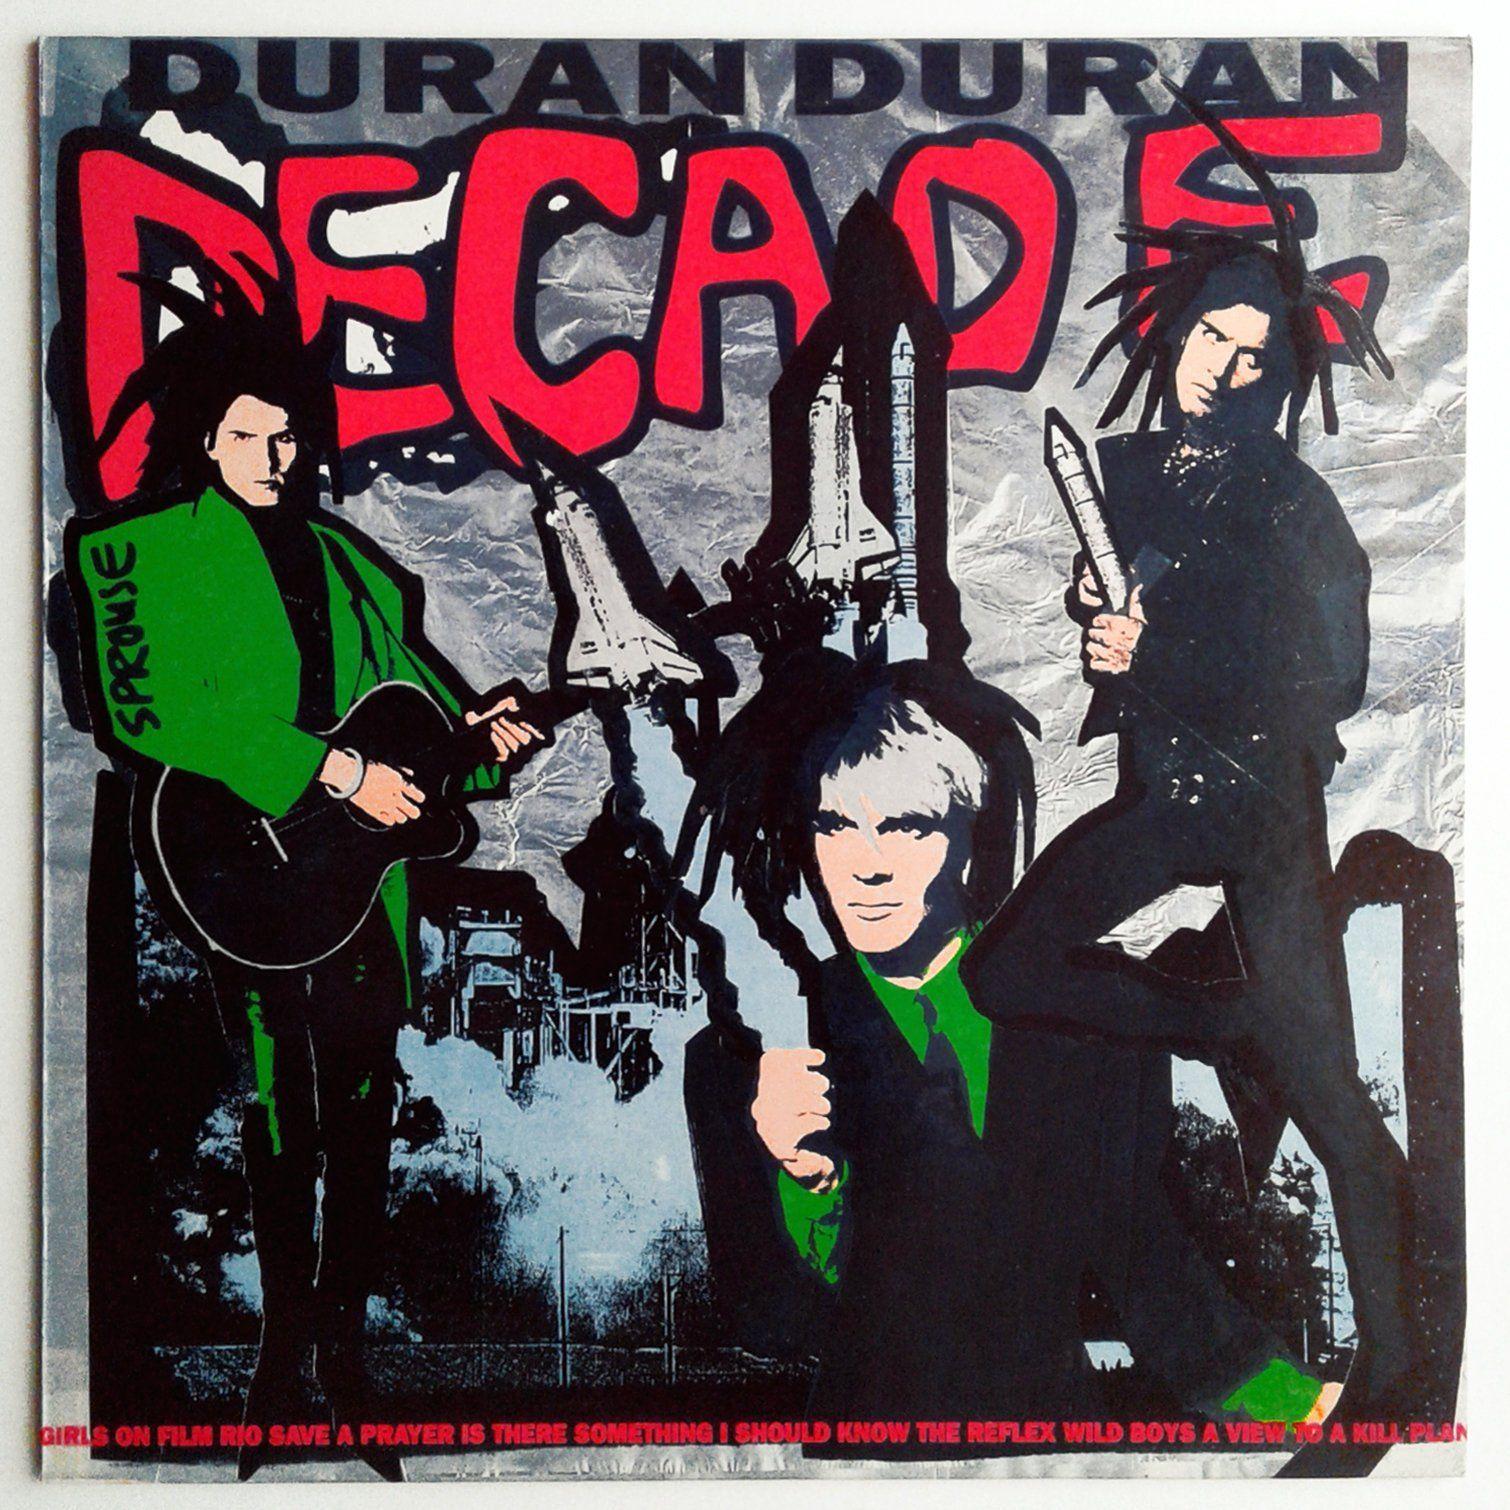 Duran Duran Decade Vinyl Record Compilation Greatest Hits Lp